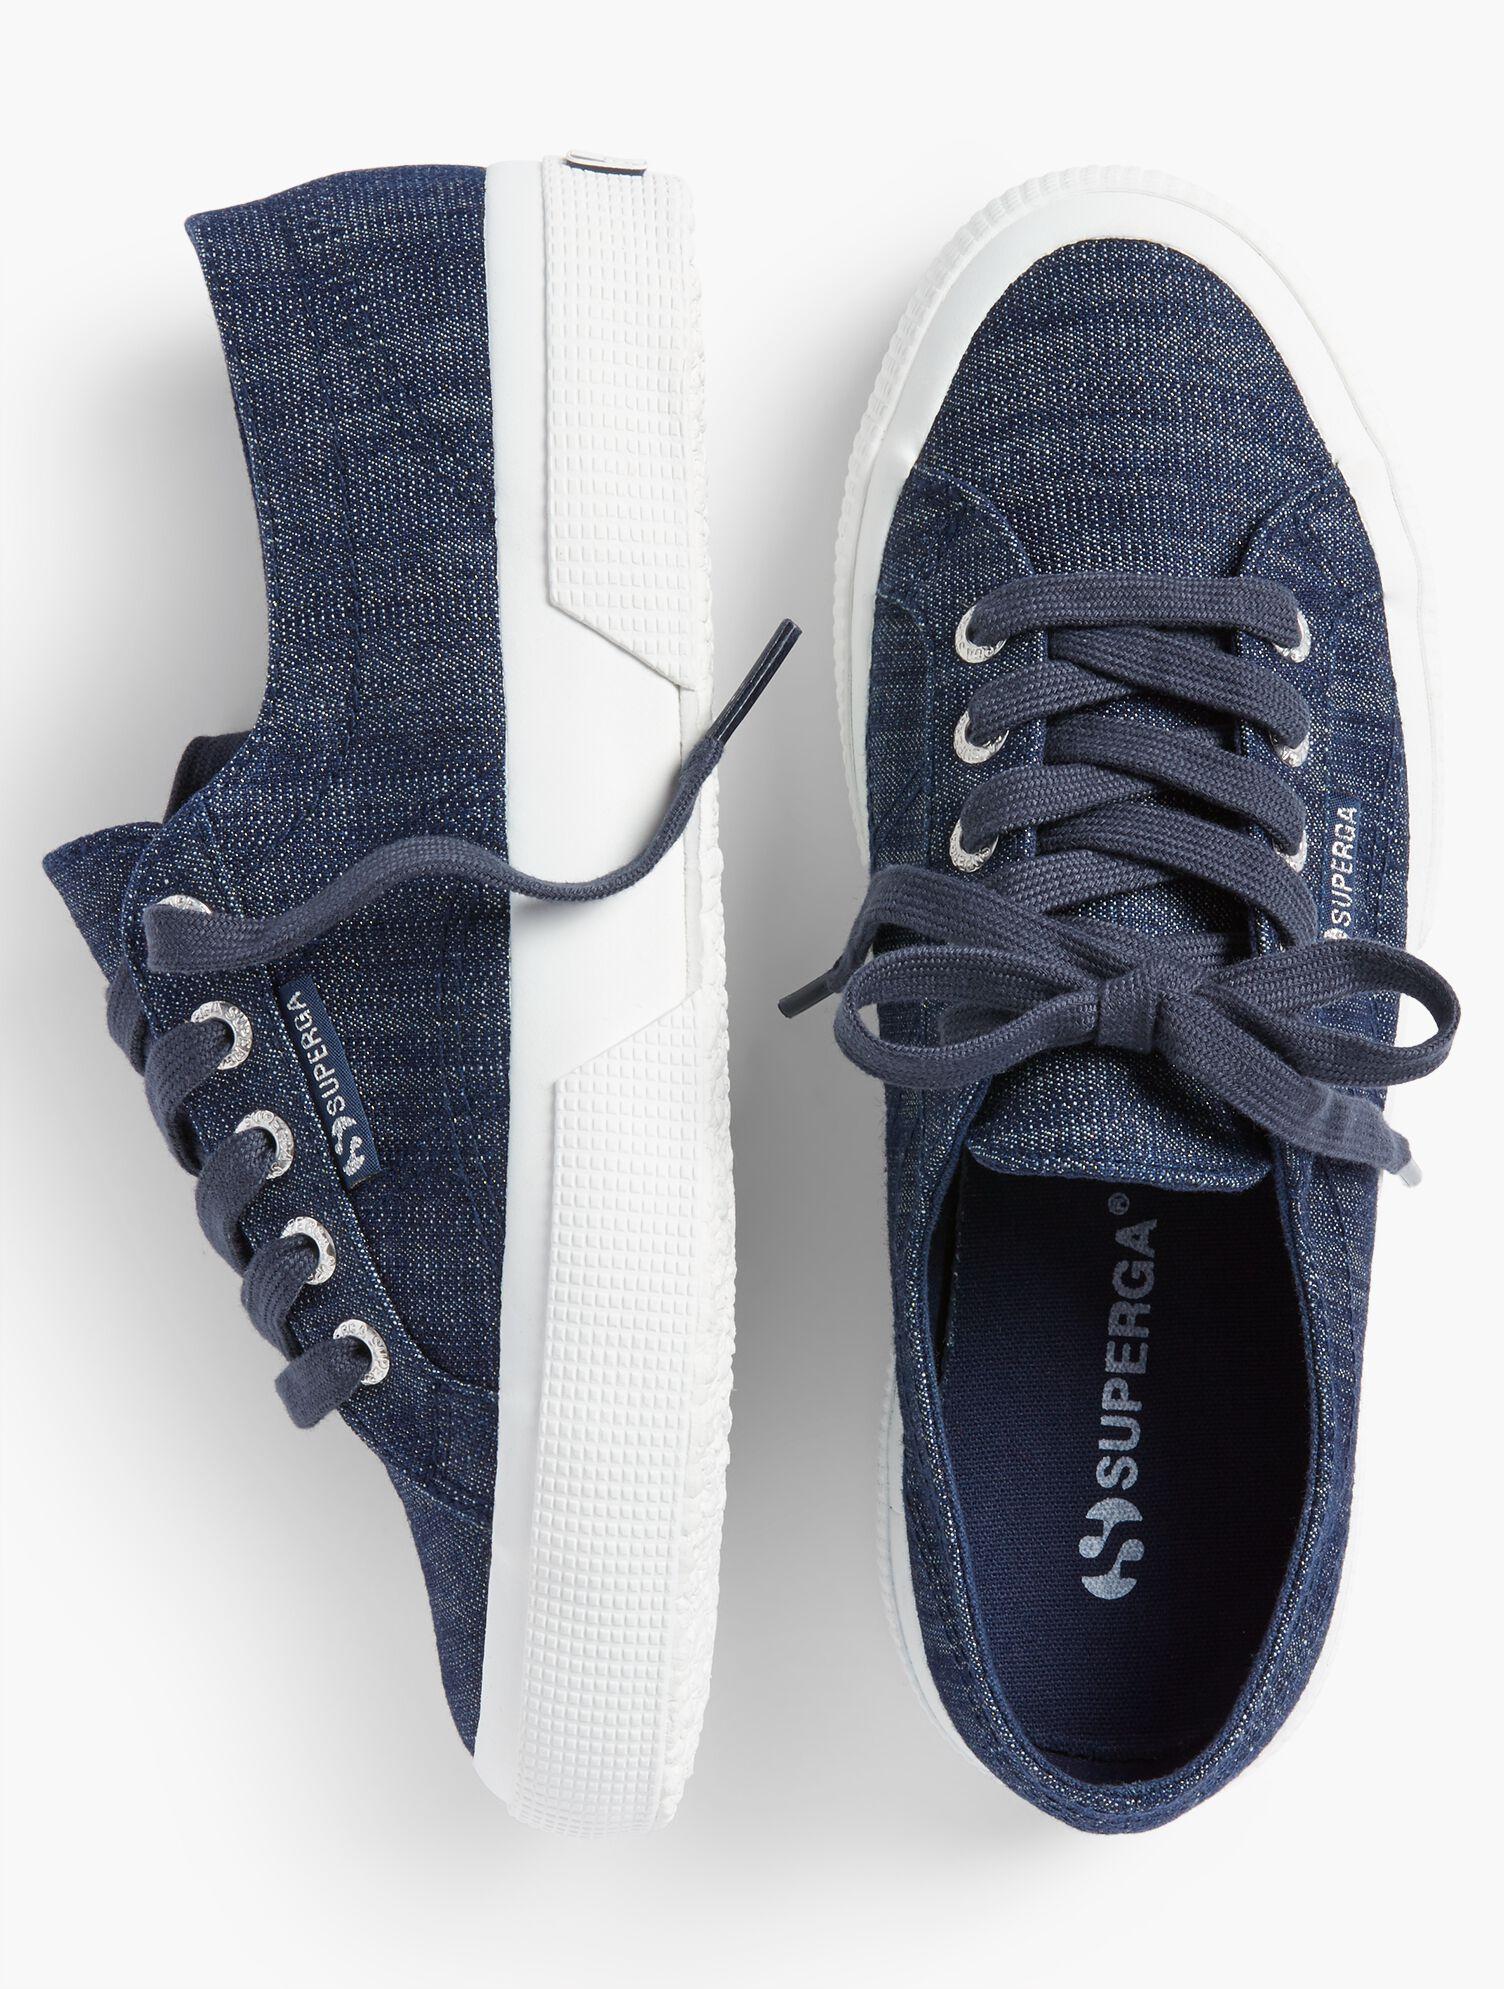 Superga(R) Sneakers - Denim | Talbots